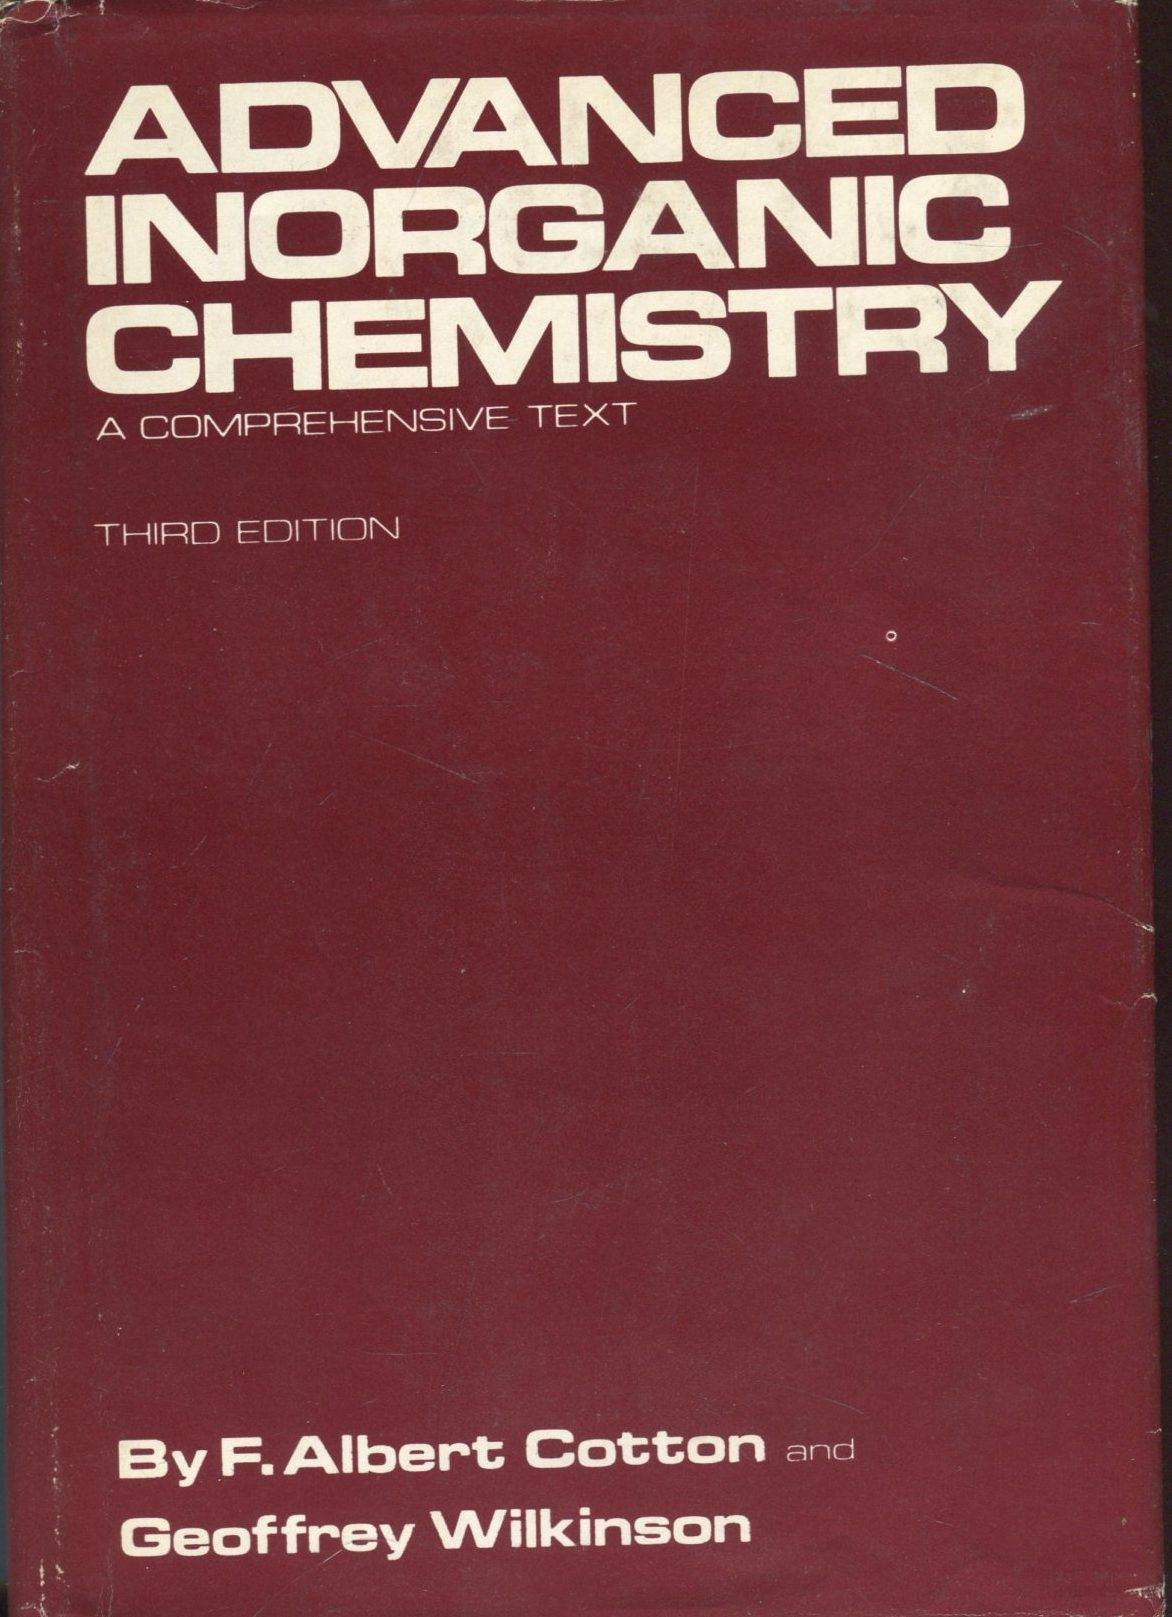 Advanced Inorganic Chemistry F. Albert Cotton, Geoffrey Wilkinson